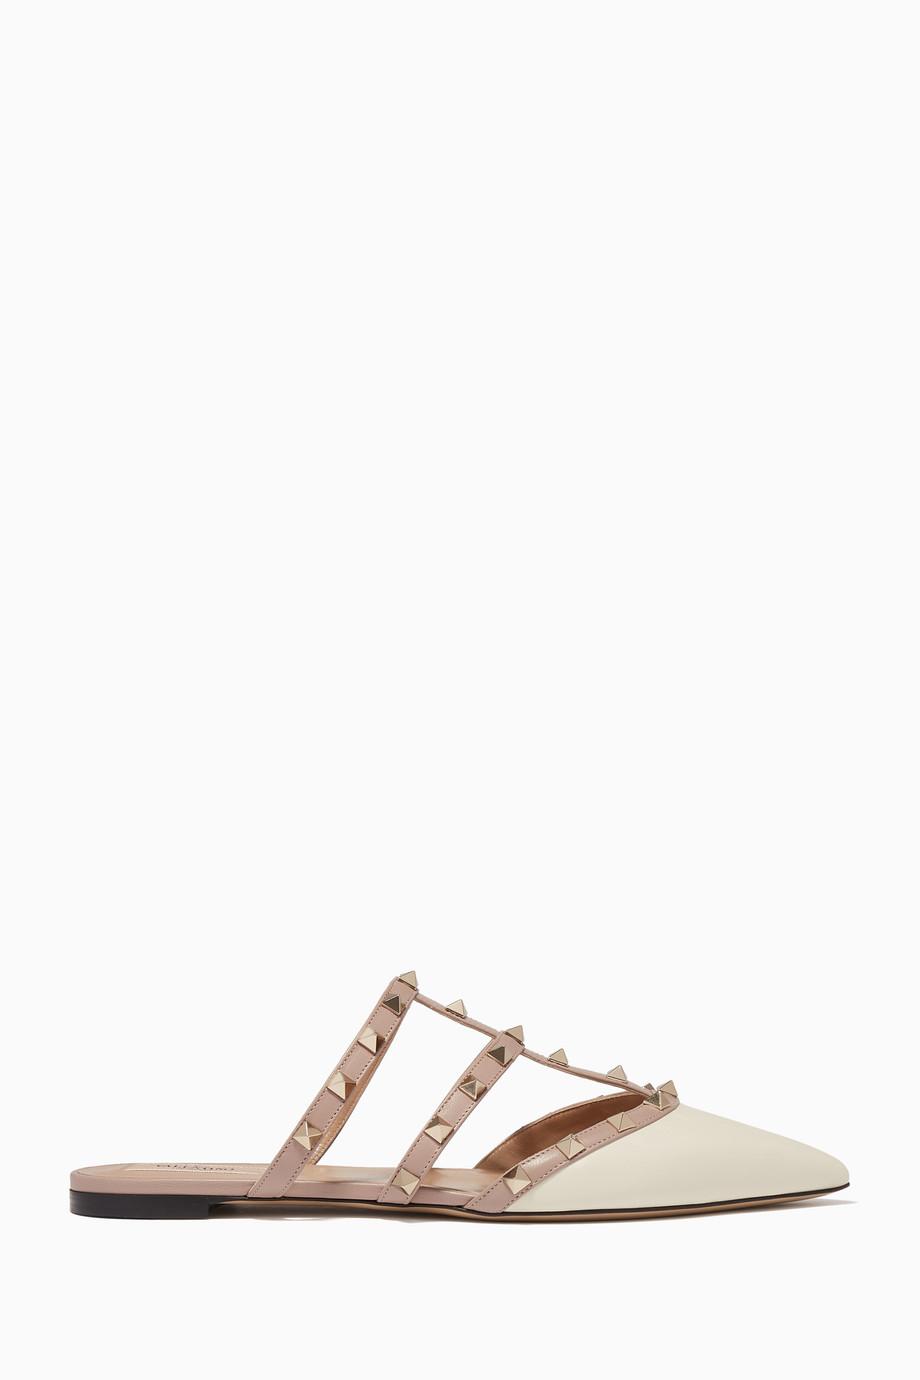 b55ecce3dcc2d Shop Valentino Neutral Rockstud Flat Mules for Women | Ounass UAE